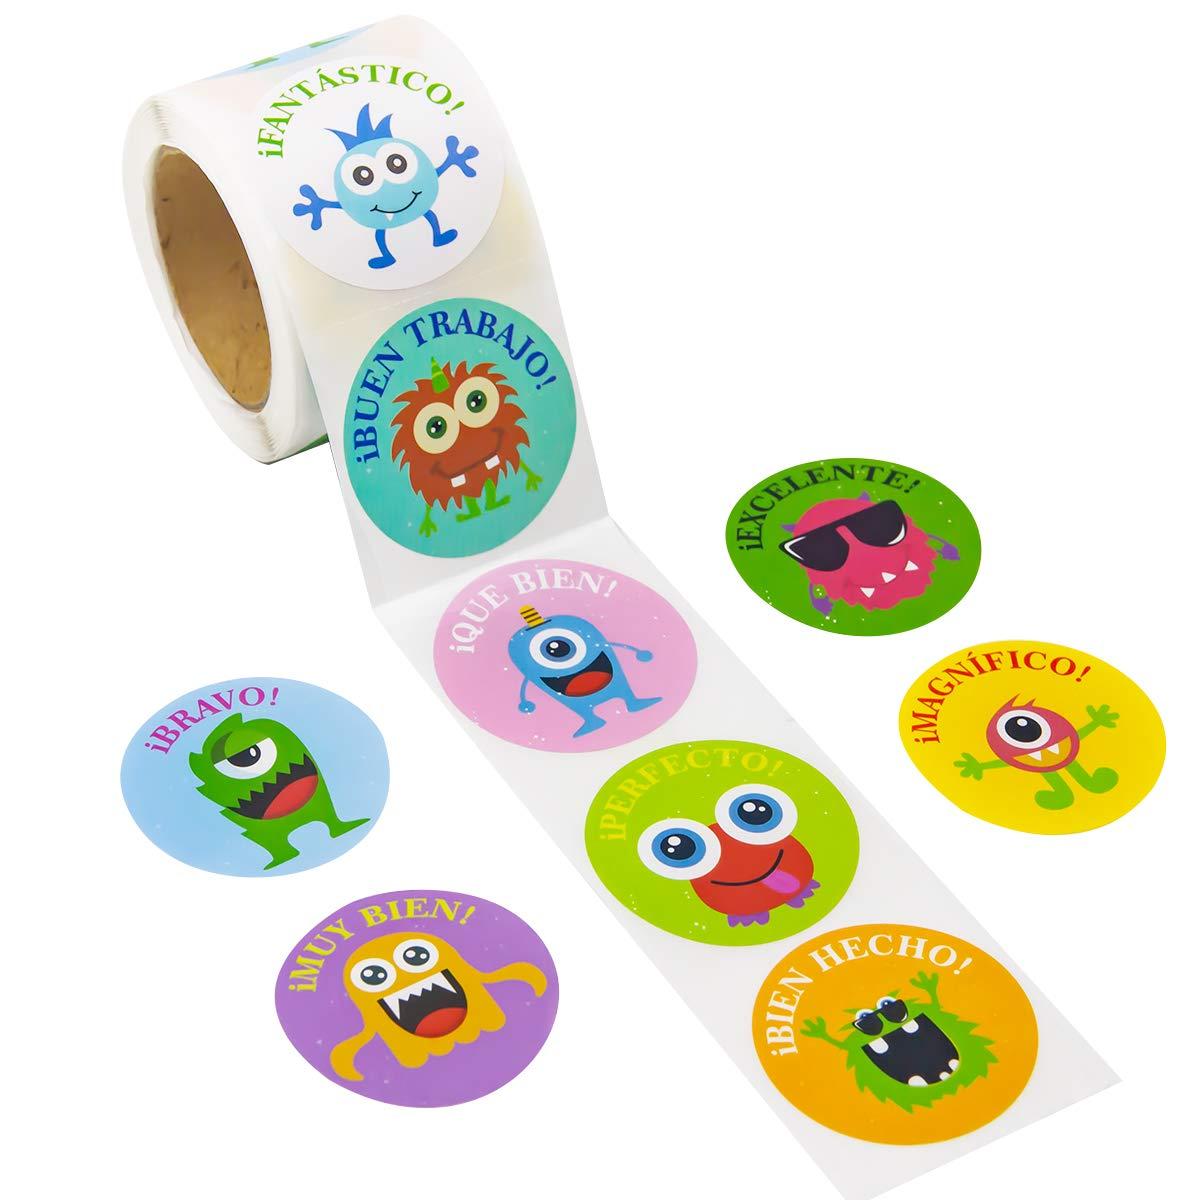 8453 Creative Teaching Press So Much Pun Punny Rewards Stickers